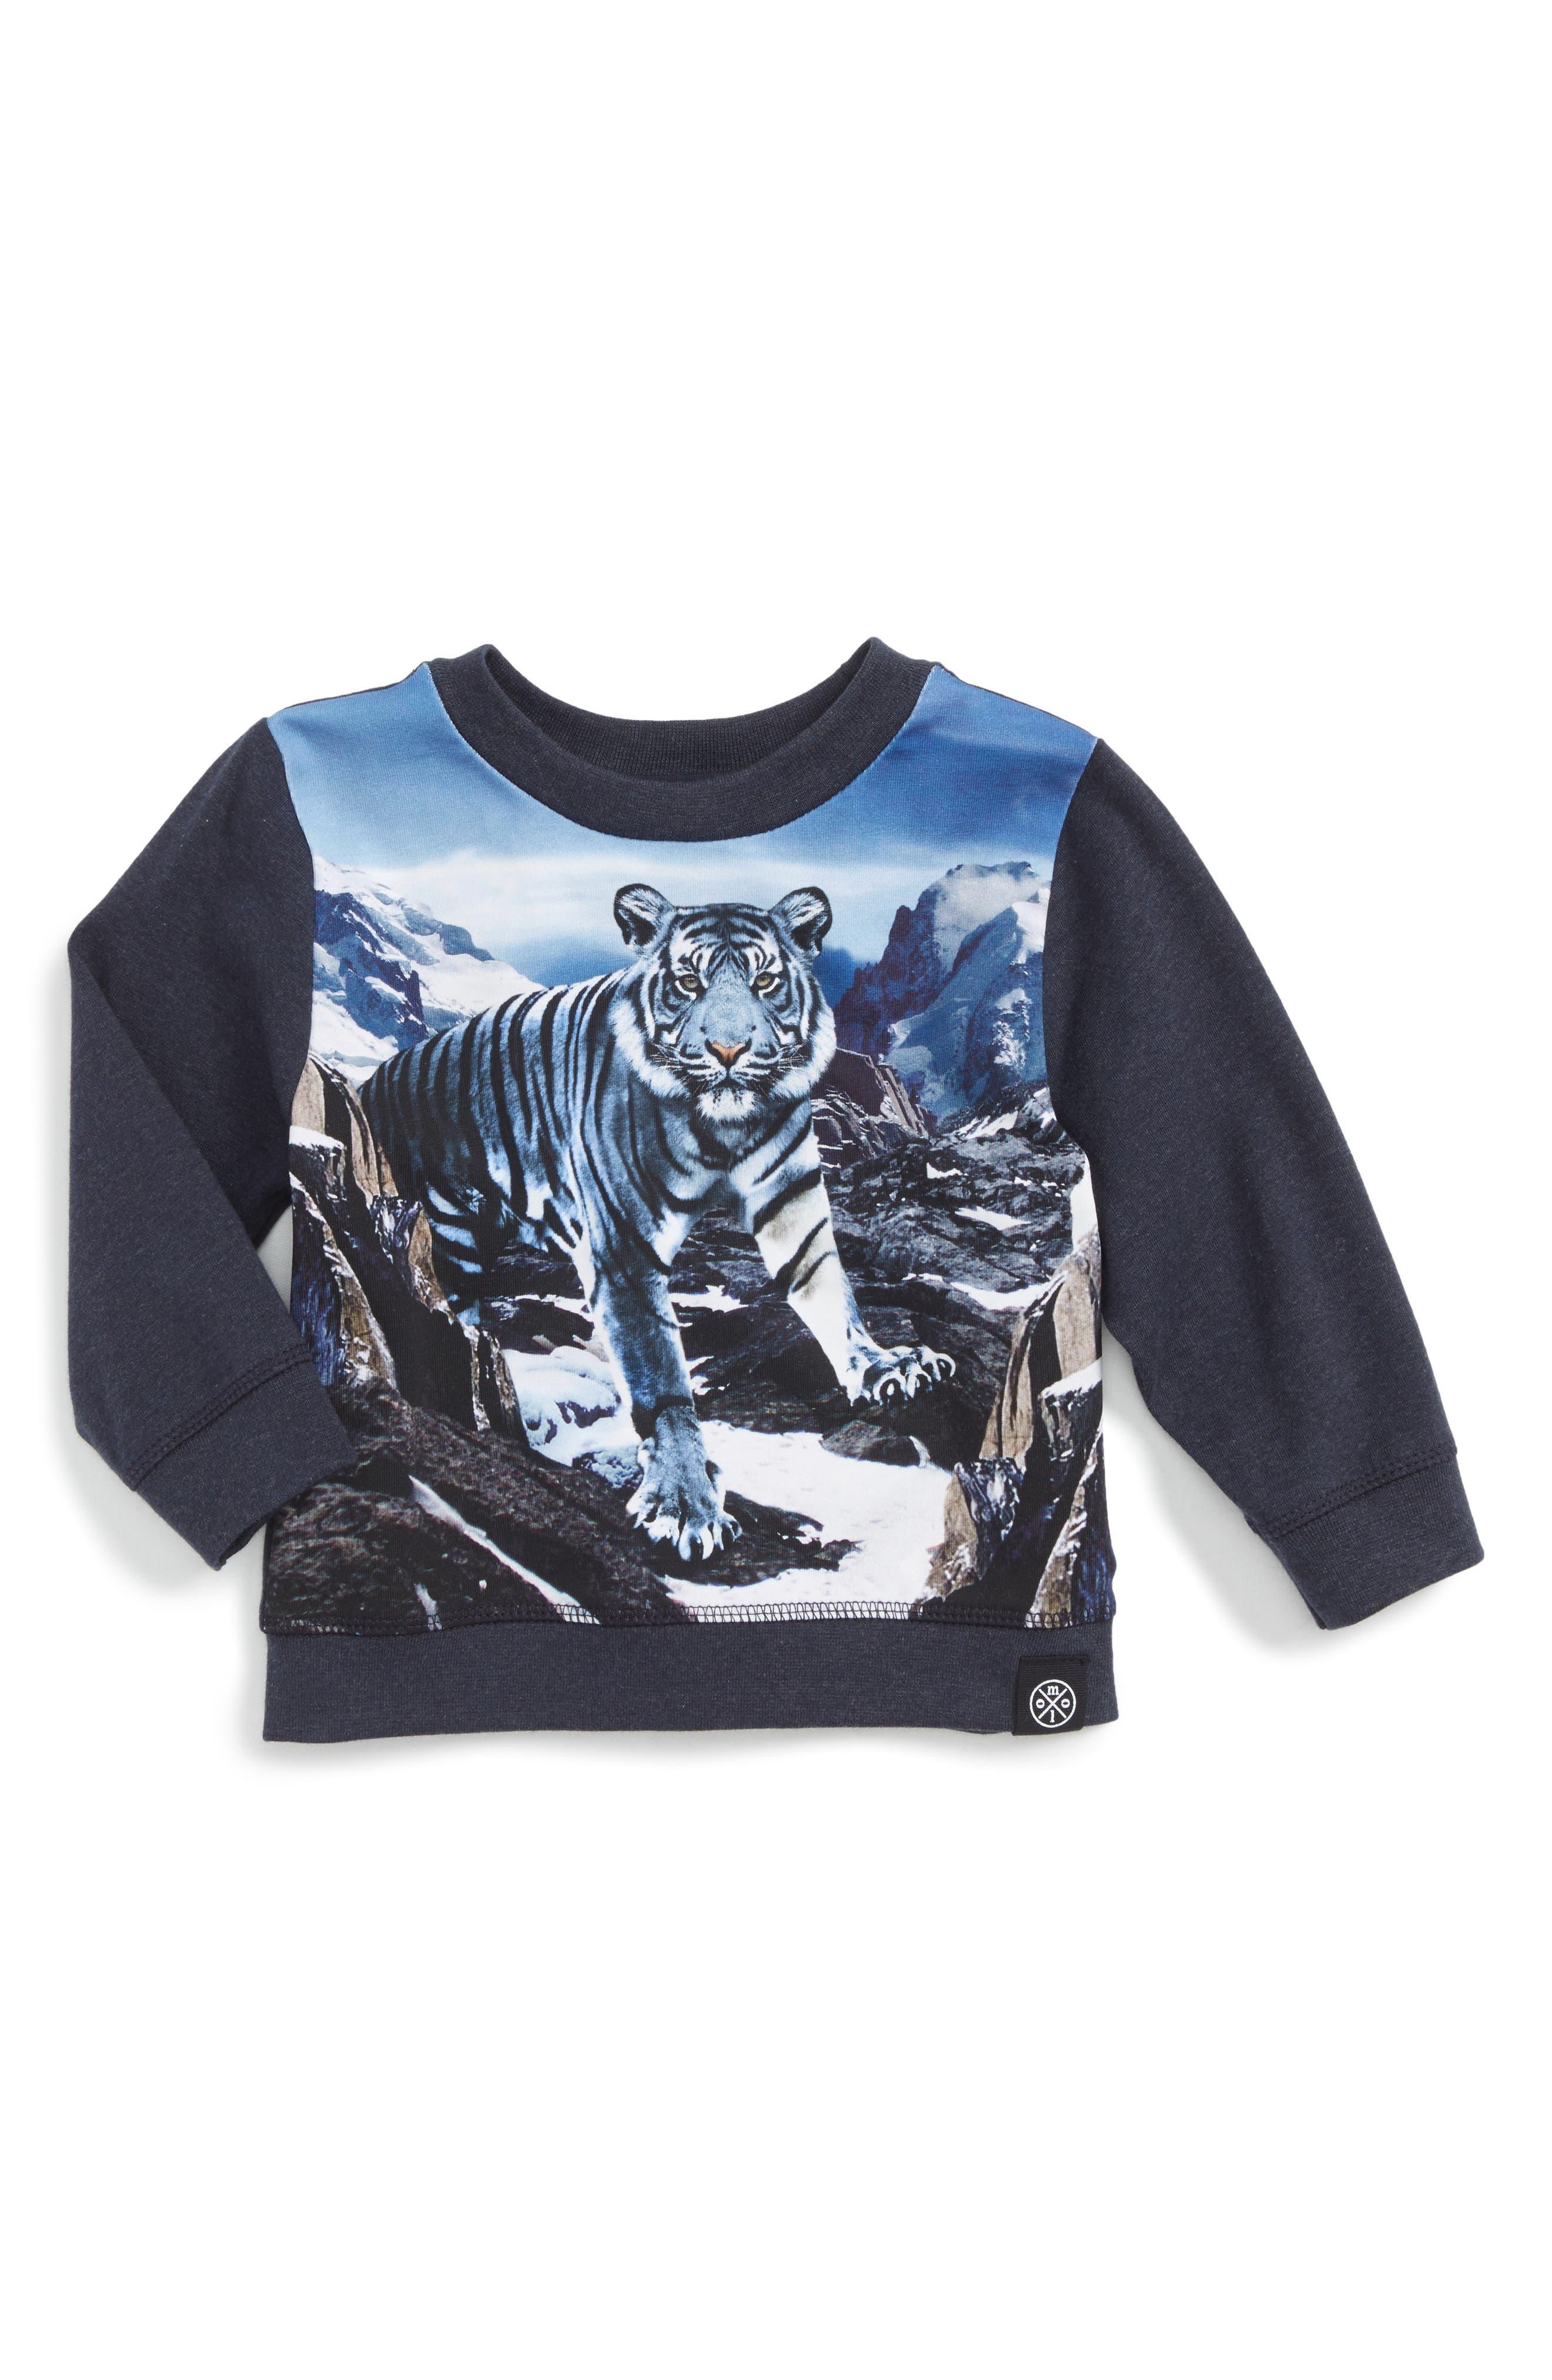 Tiger Graphic T-Shirt,                             Main thumbnail 1, color,                             Blue Mountains